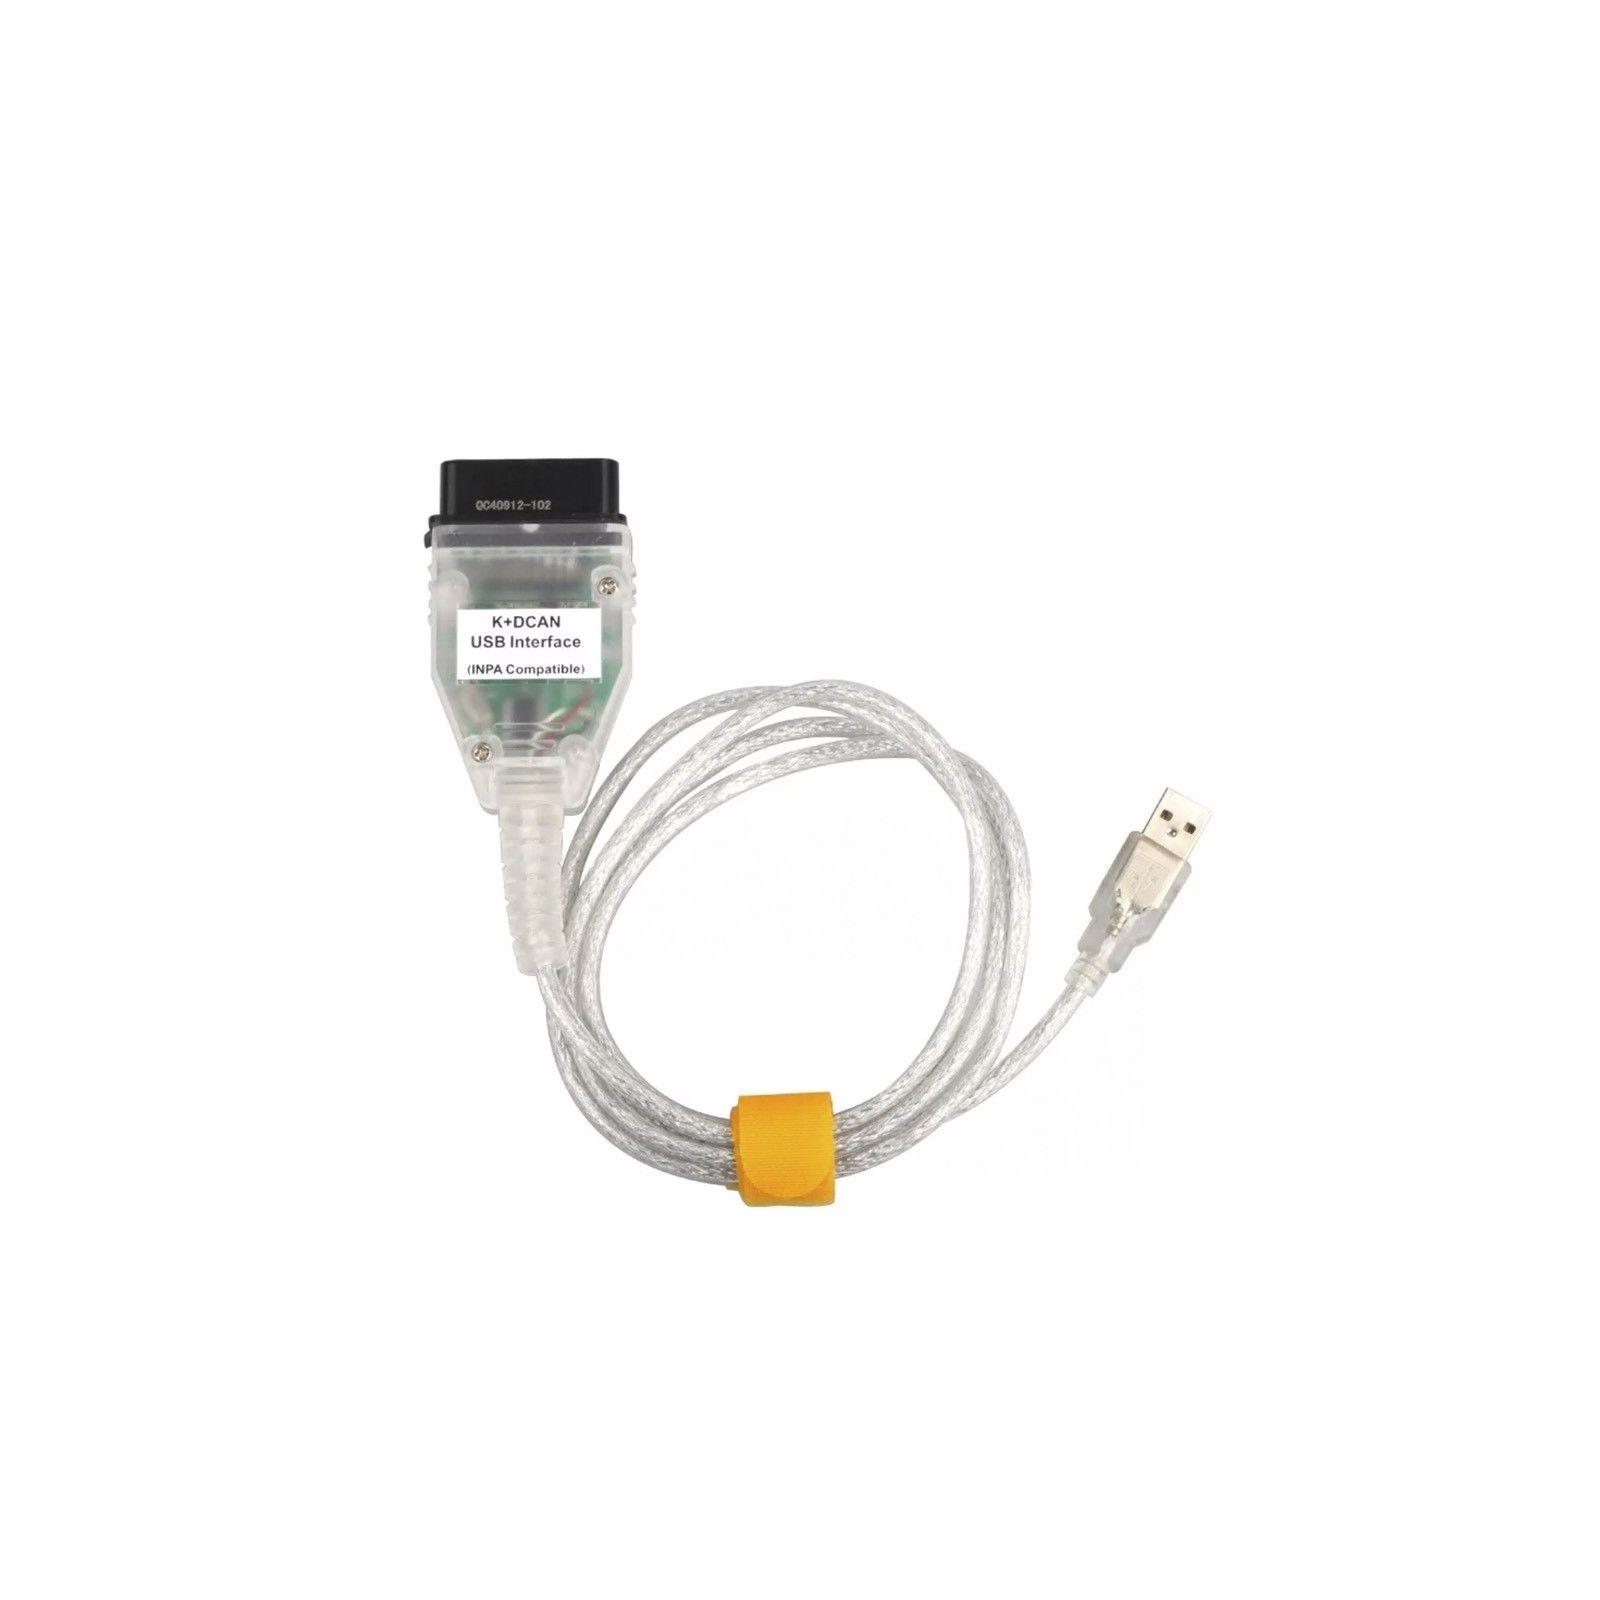 great bmw k dcan obd2 usb cable ftdi ft232rl bmw tools inpa ediabas ncs  expert